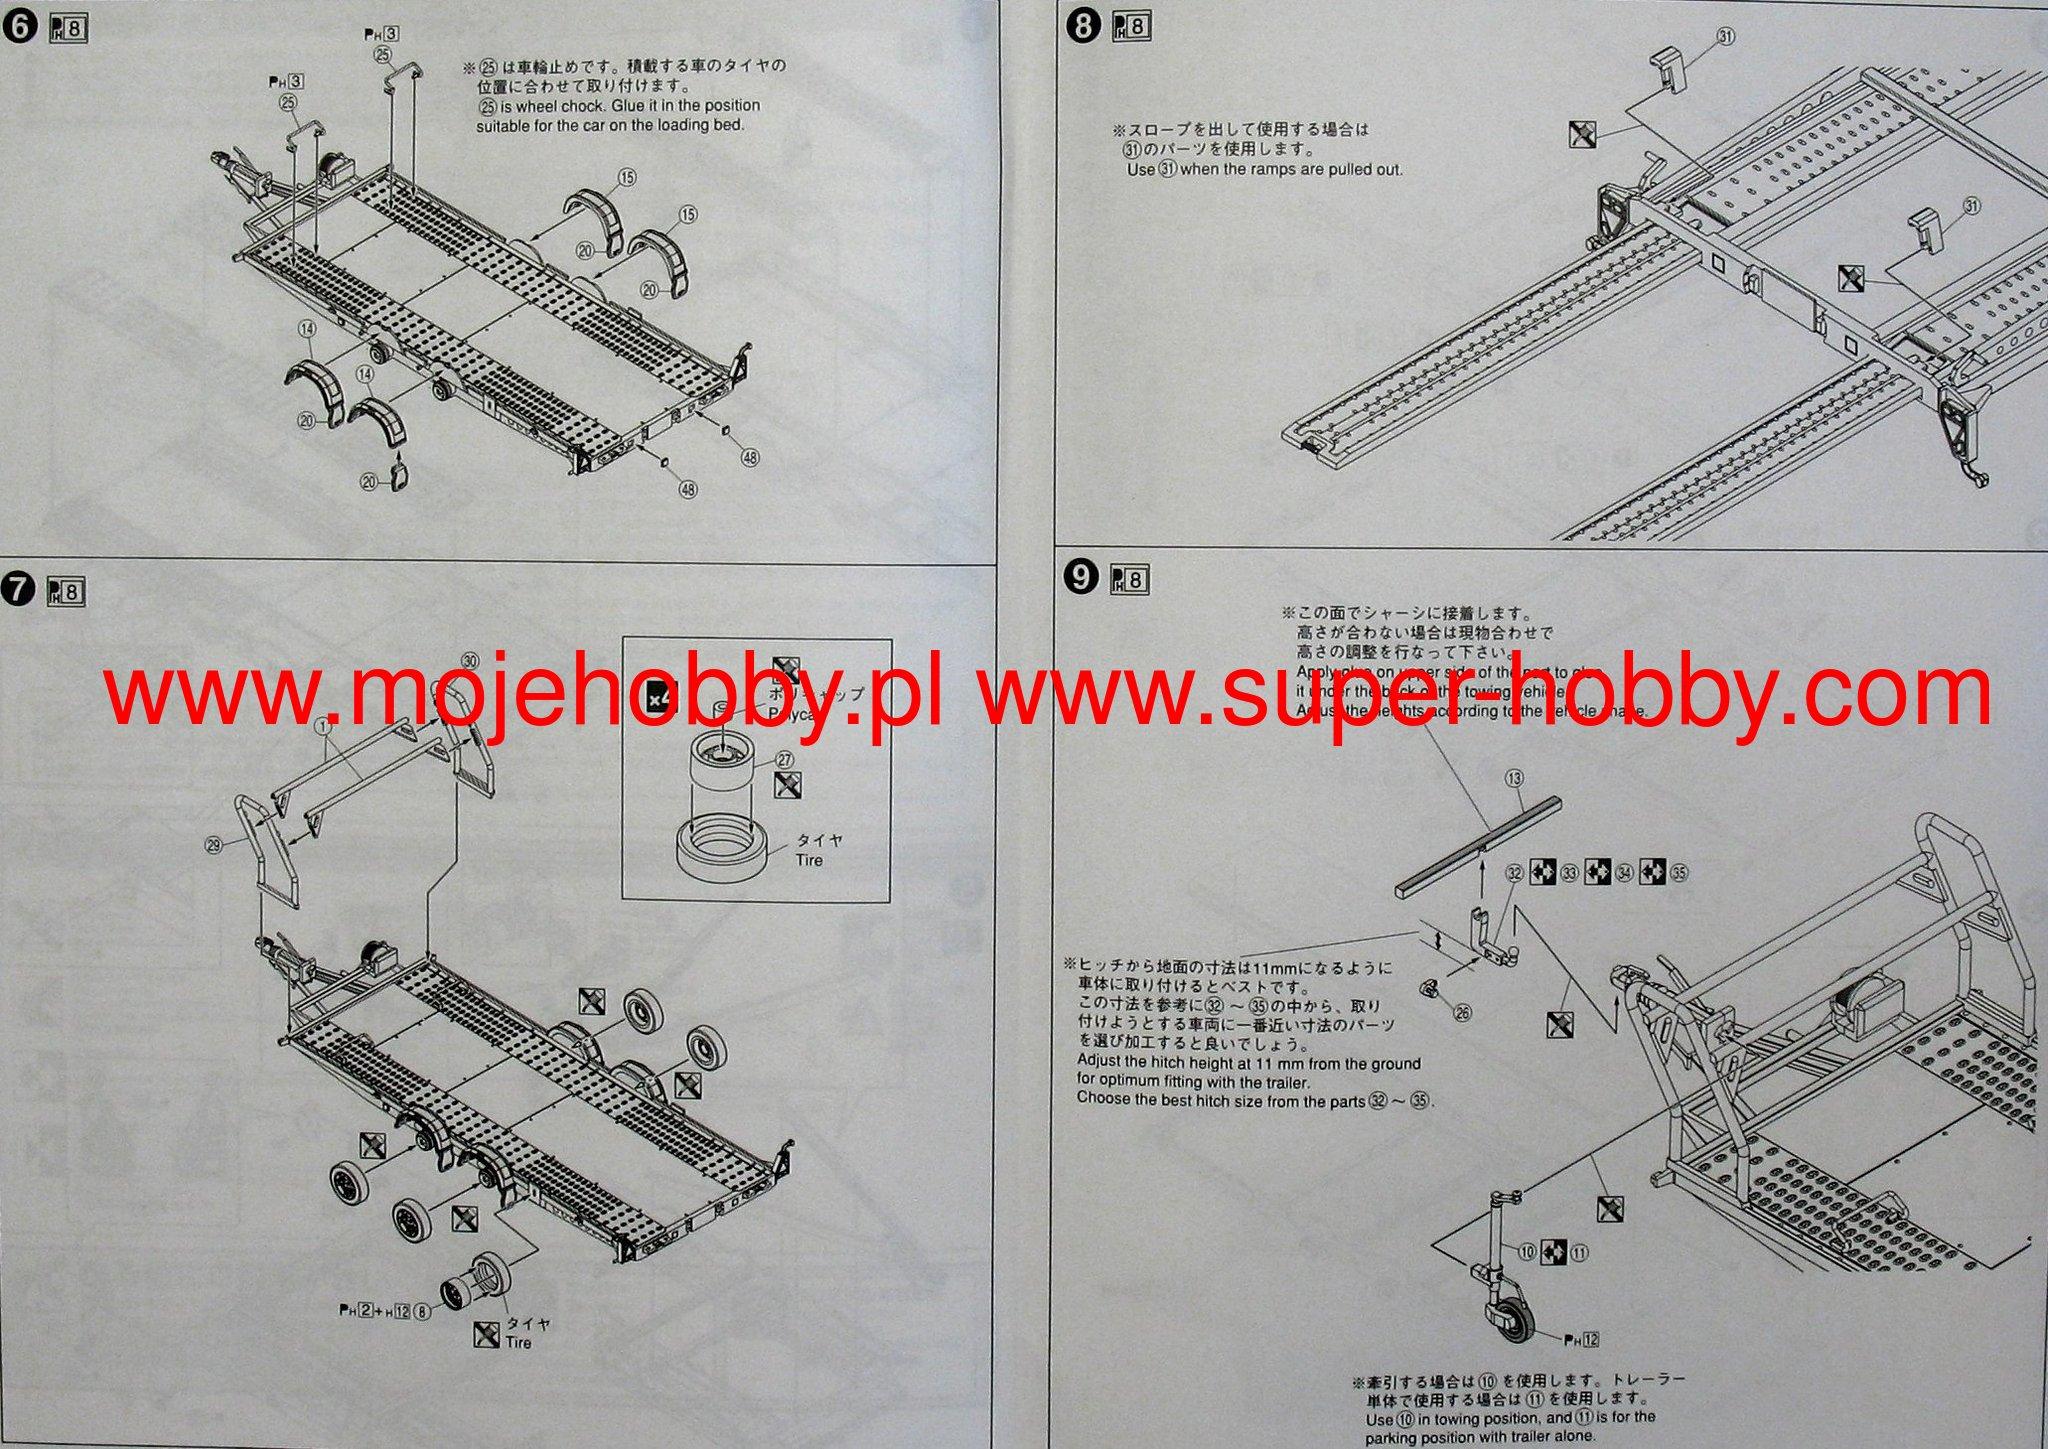 Brian James Trailer Wiring Diagram - DIY Enthusiasts Wiring Diagrams •